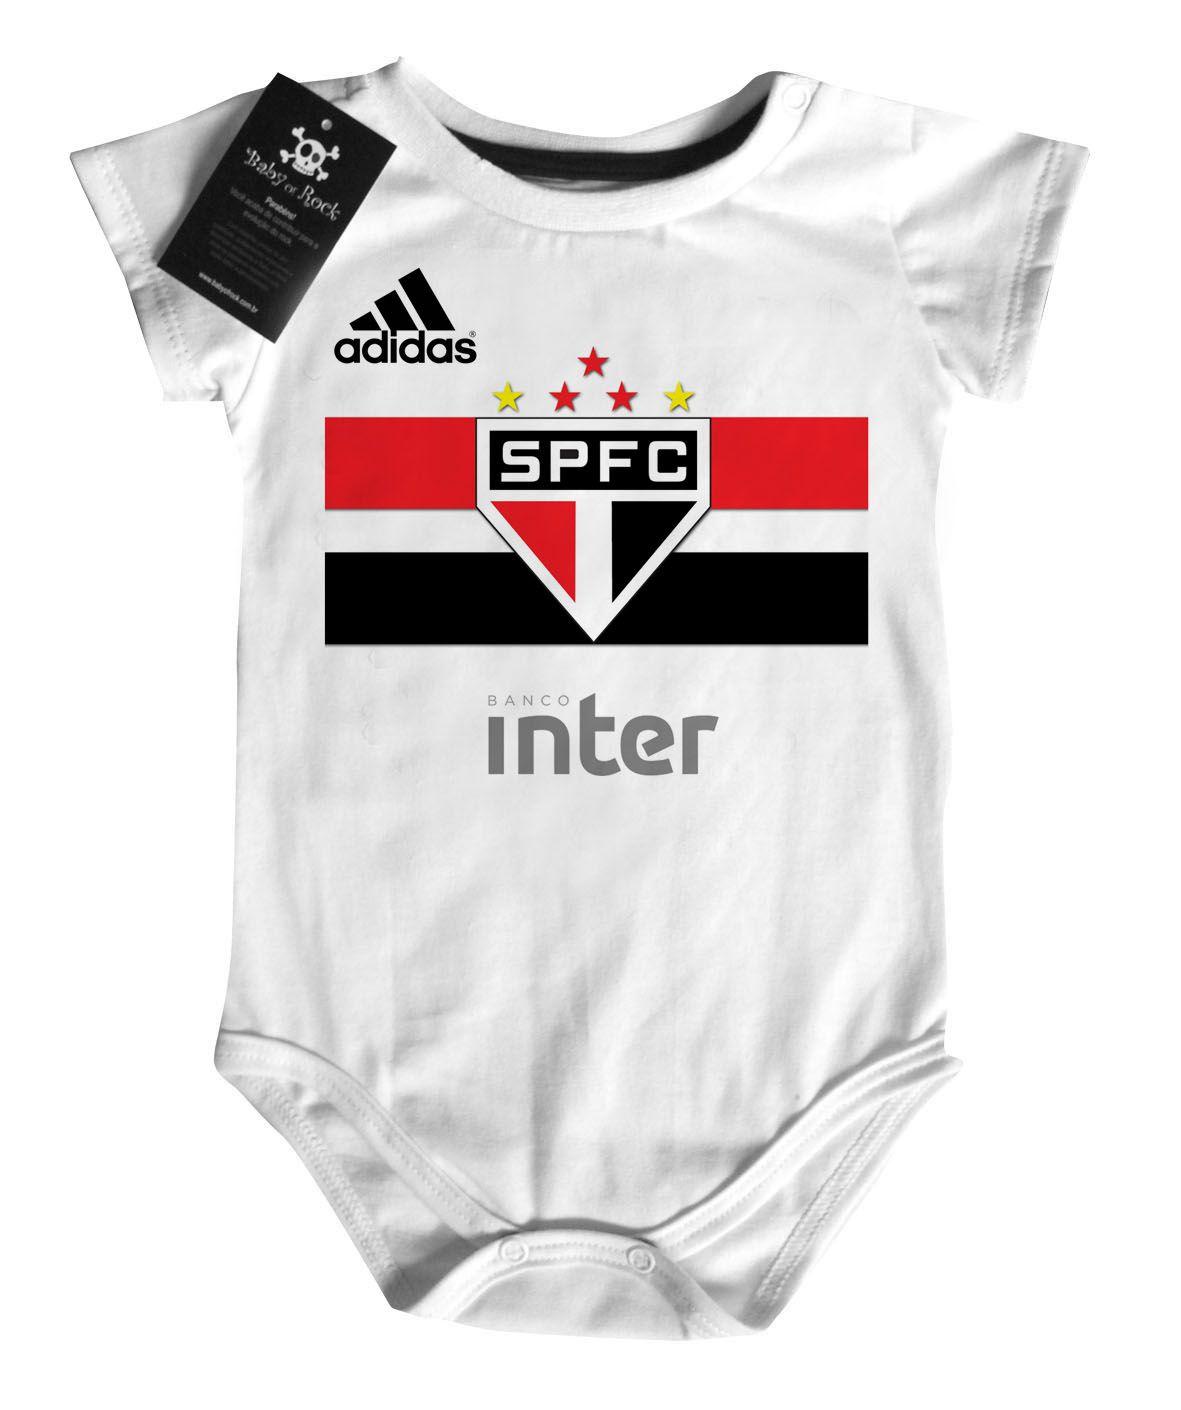 CÓPIA - Body Bebe de  São Paulo Futebol - Campeão  - Baby Monster - Body Bebe